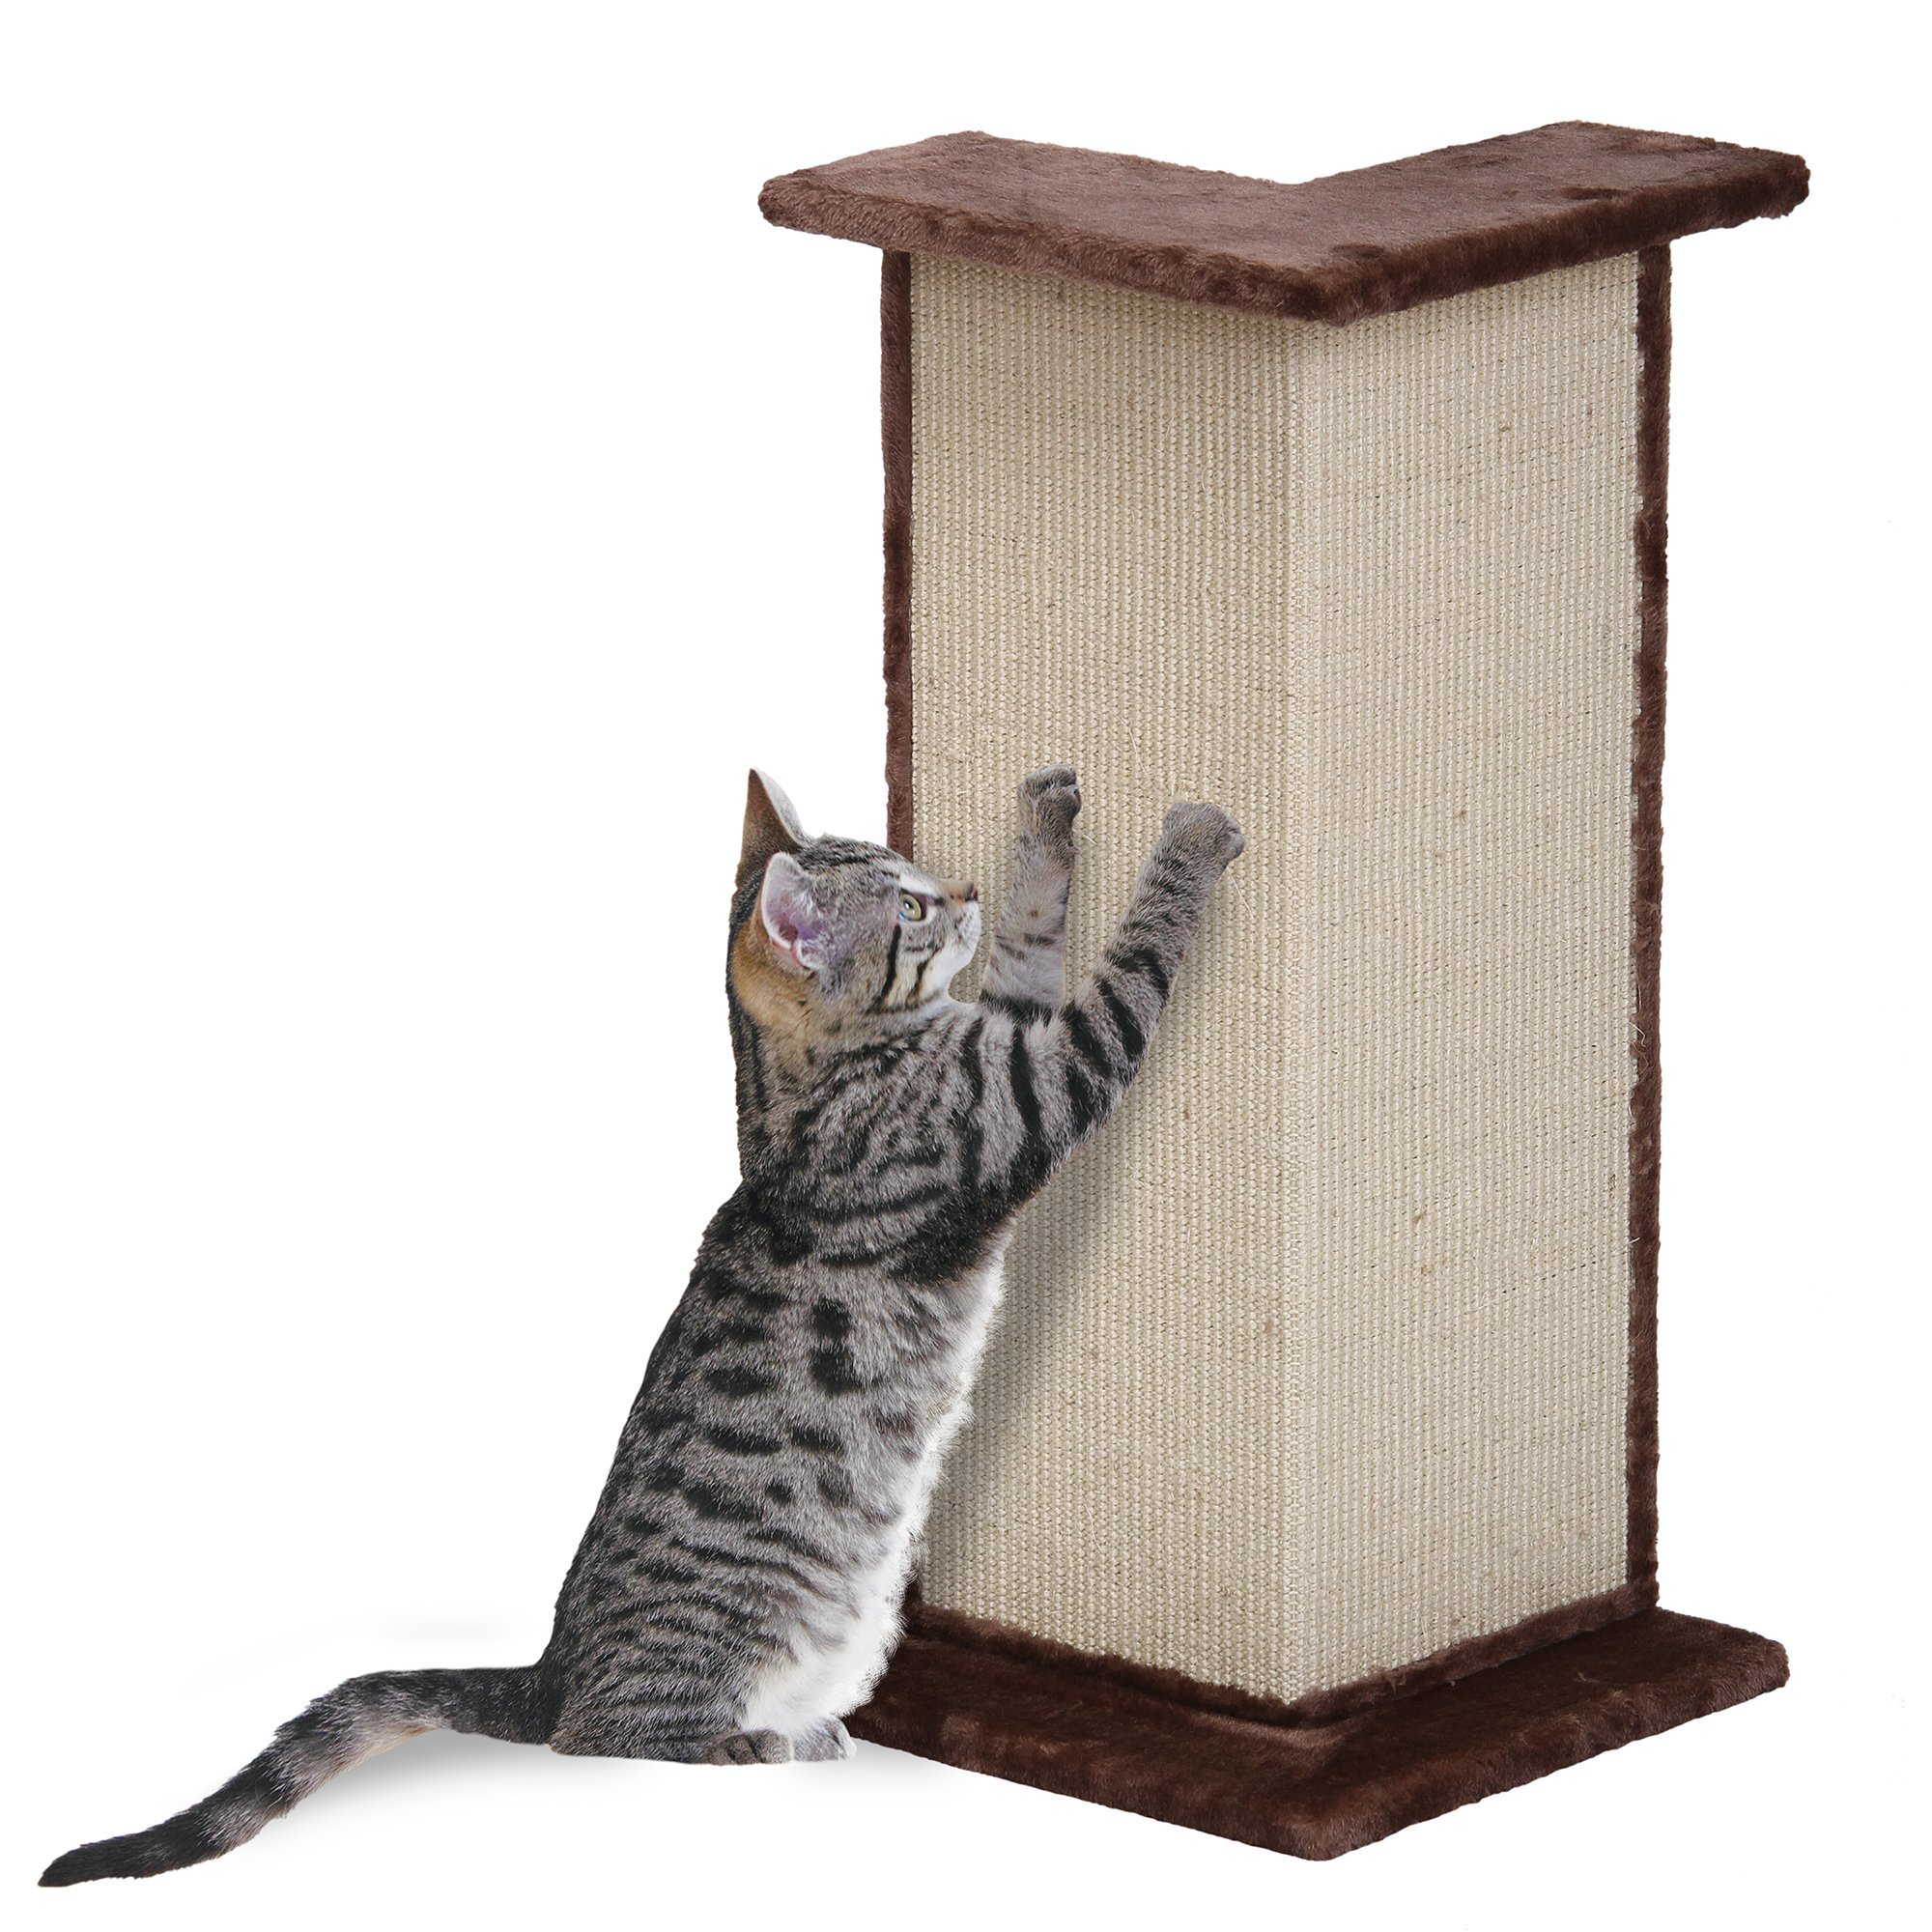 Penn-Plax Sisal Cat Scratcher Wall Corner Post and Perch by Penn-Plax